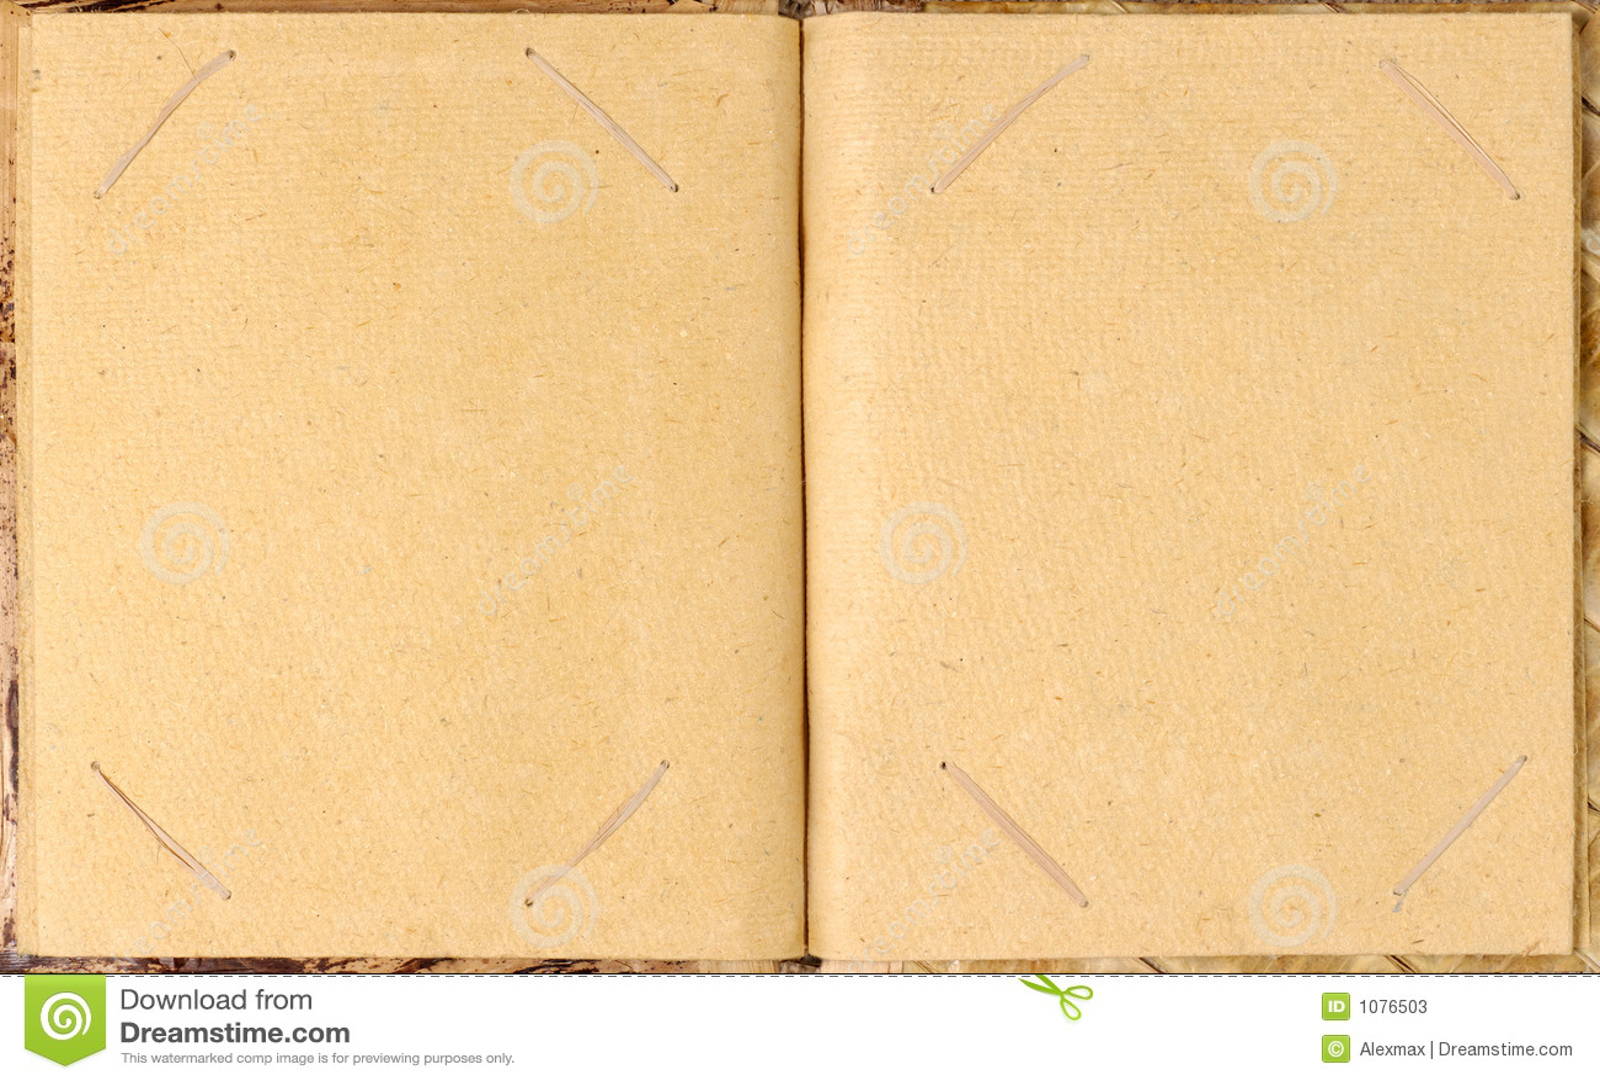 folder cover designs